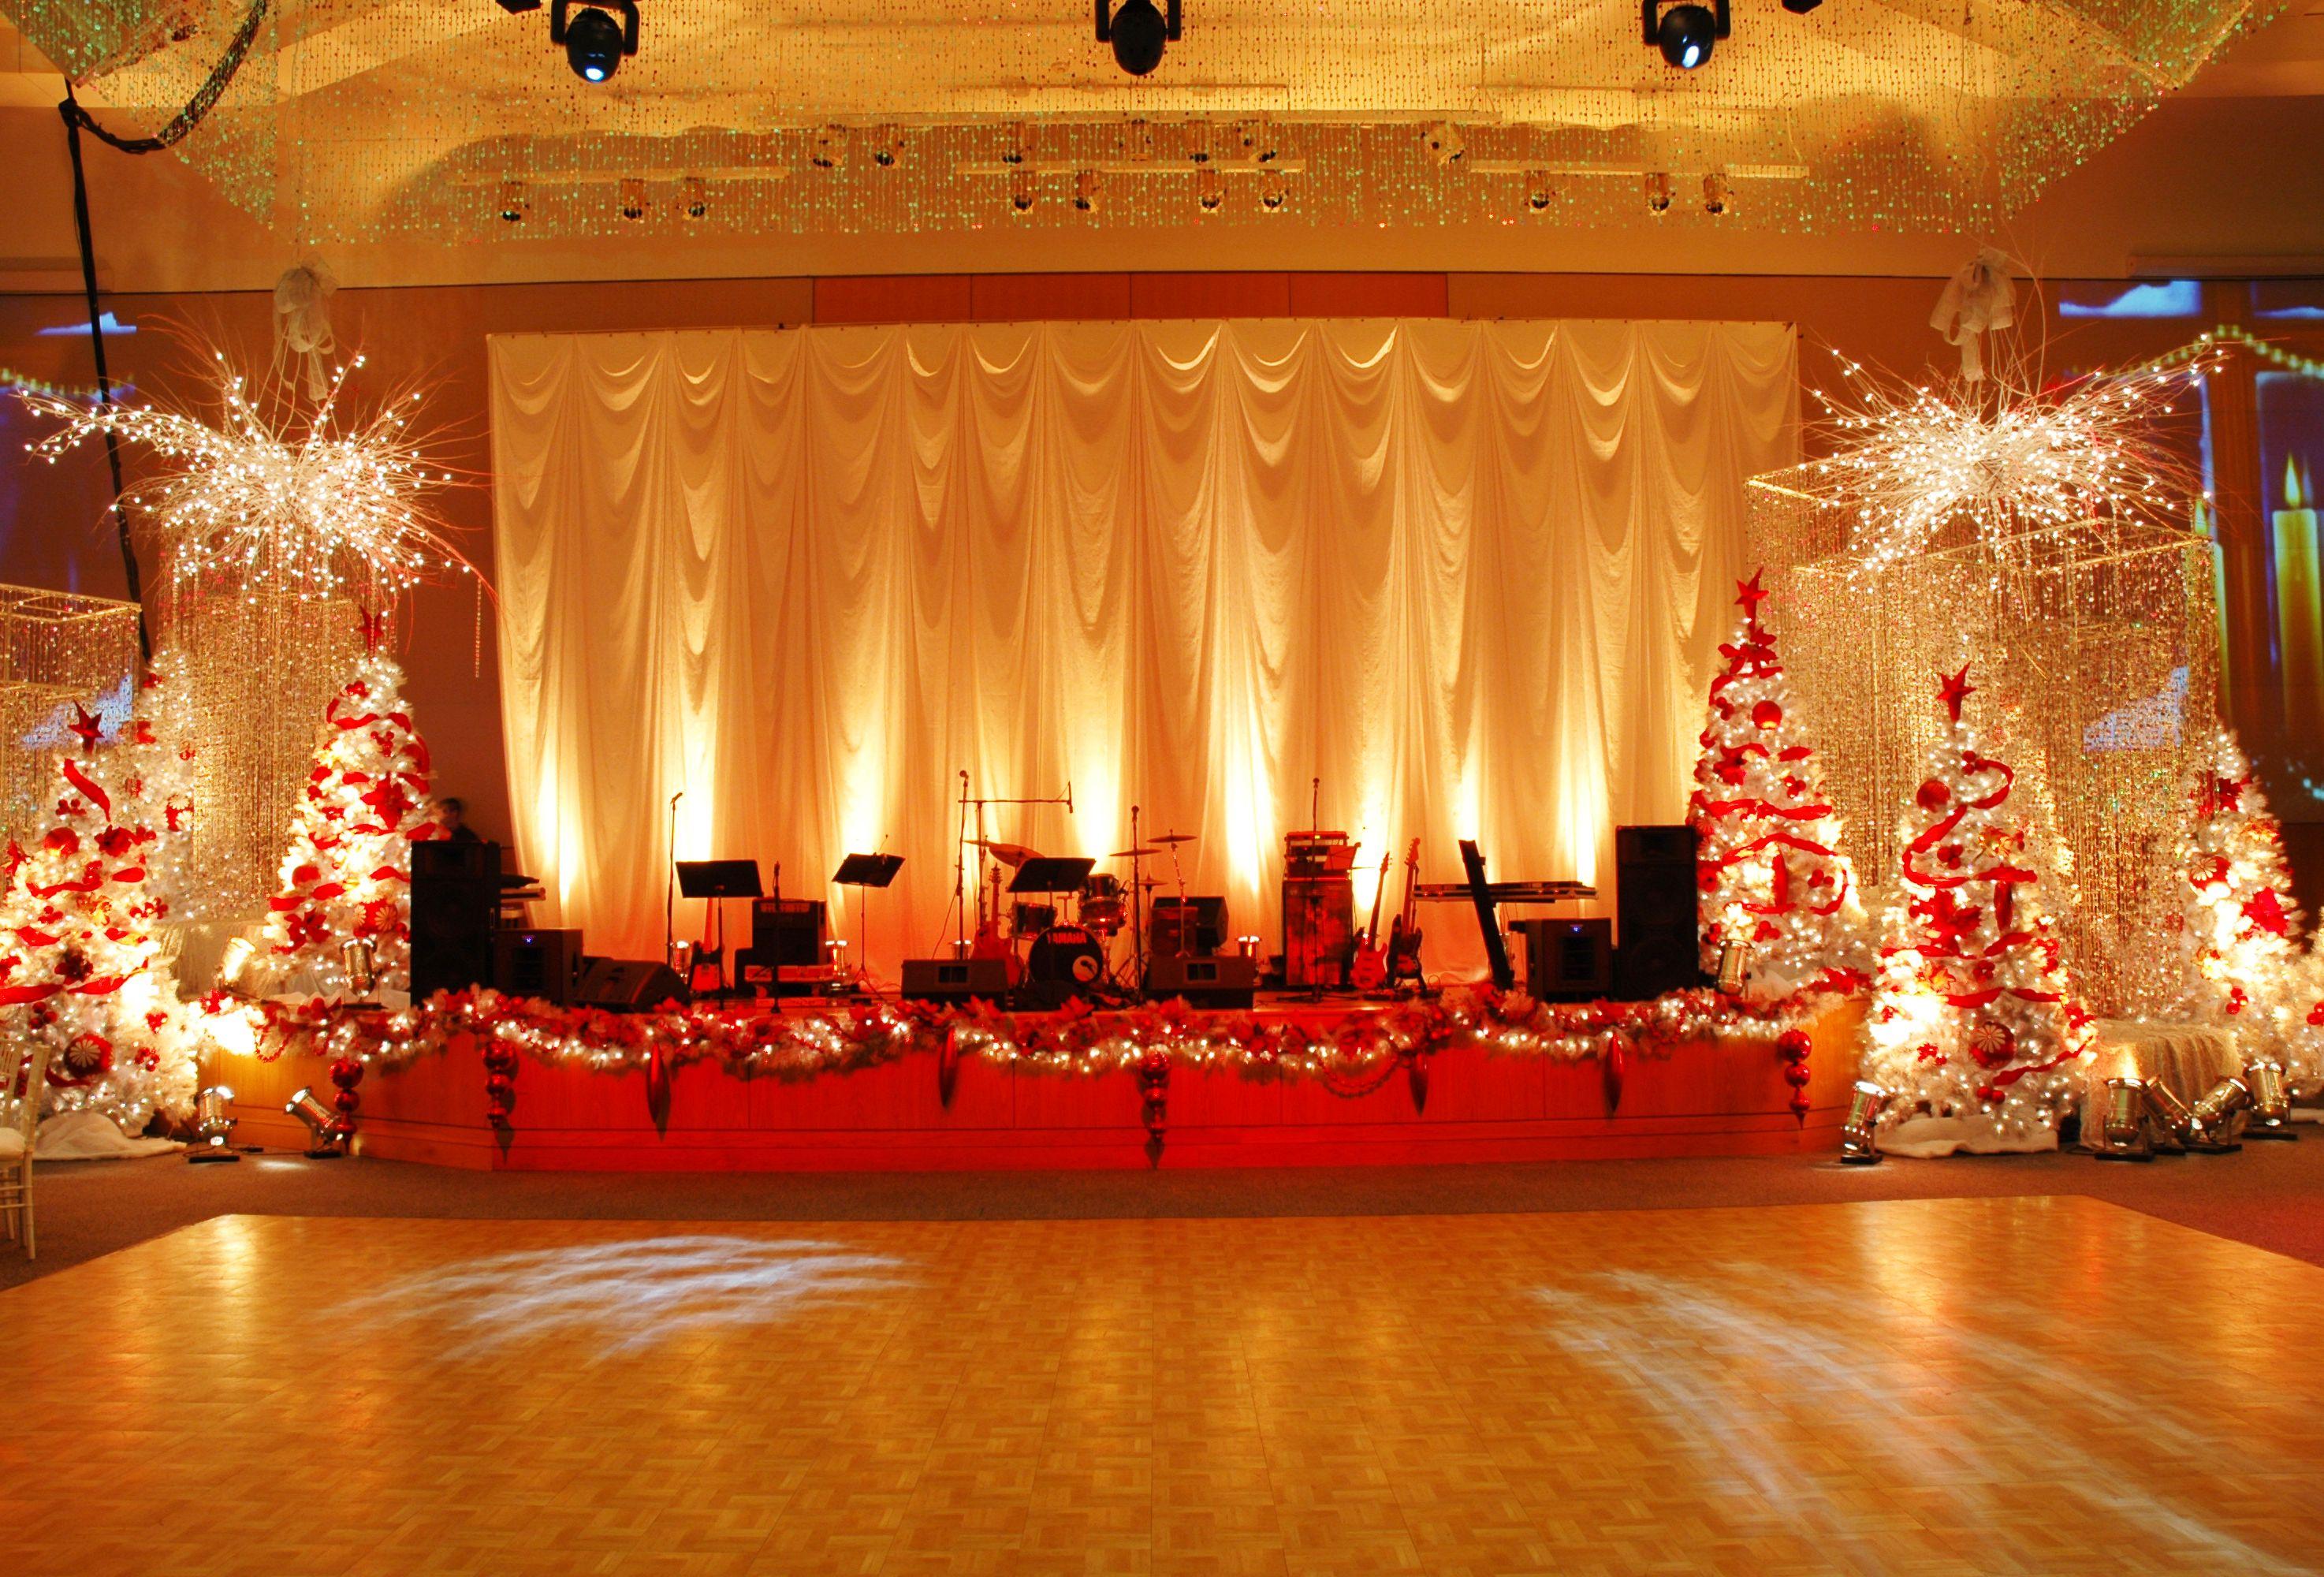 Christmas stage party decor christmas trees lights